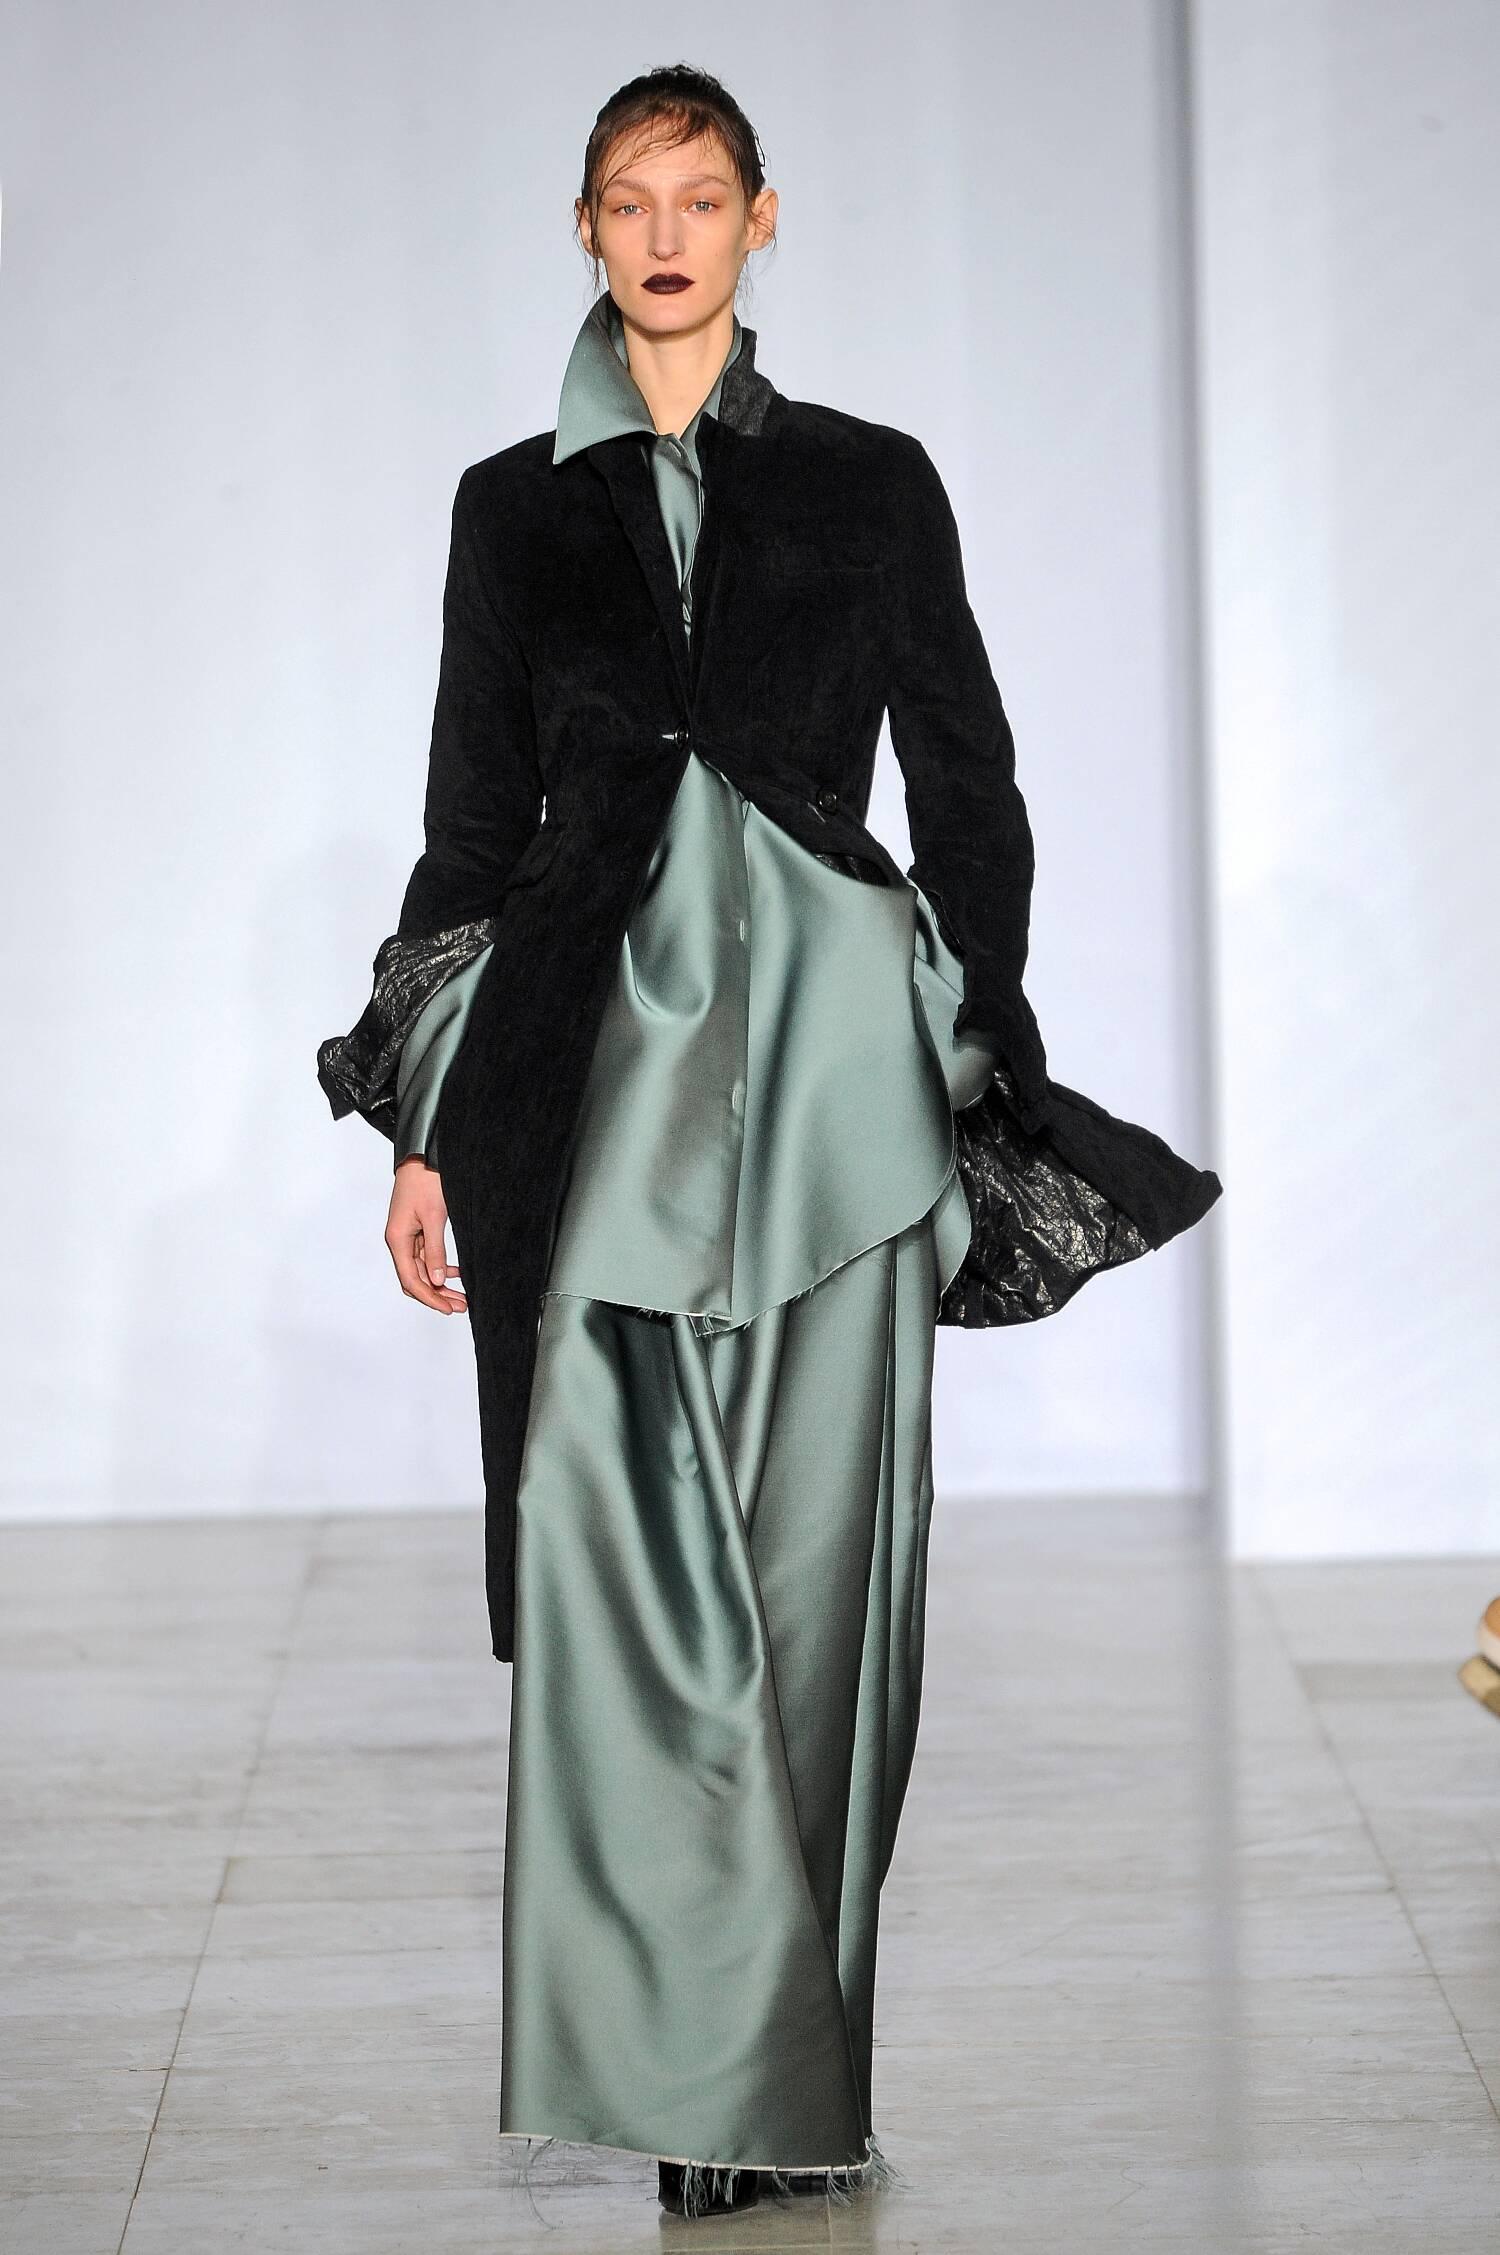 Fall 2015 Fashion Trends Yang Li Collection